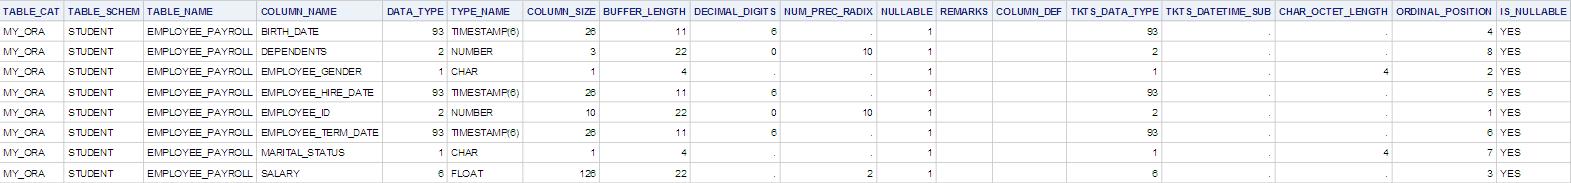 PROC FedSQL Dictionary.Columns query output